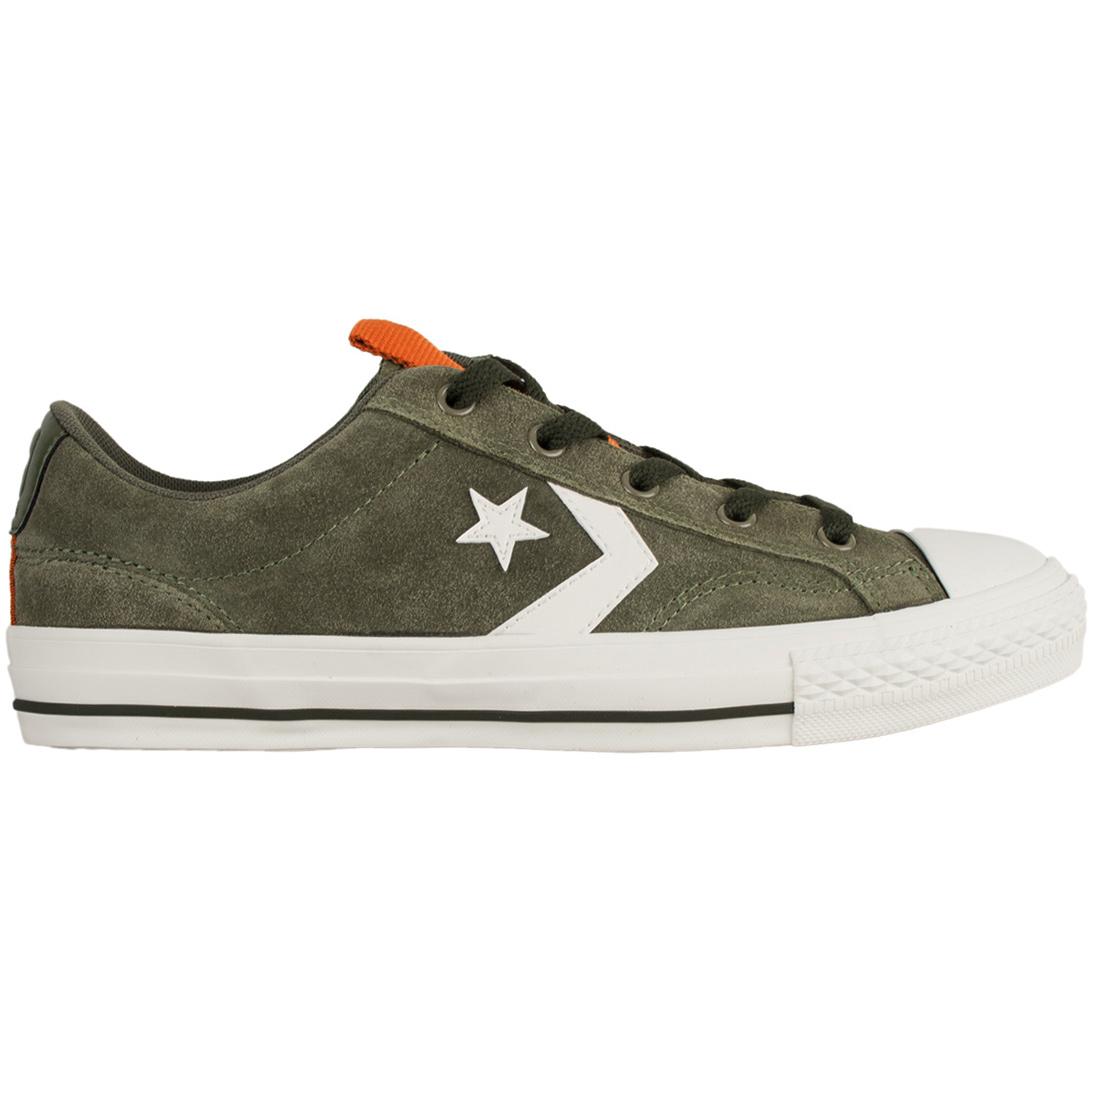 e29f581adbcdce Converse Star Player OX Herren Leder Sneaker grün weiß 162568C